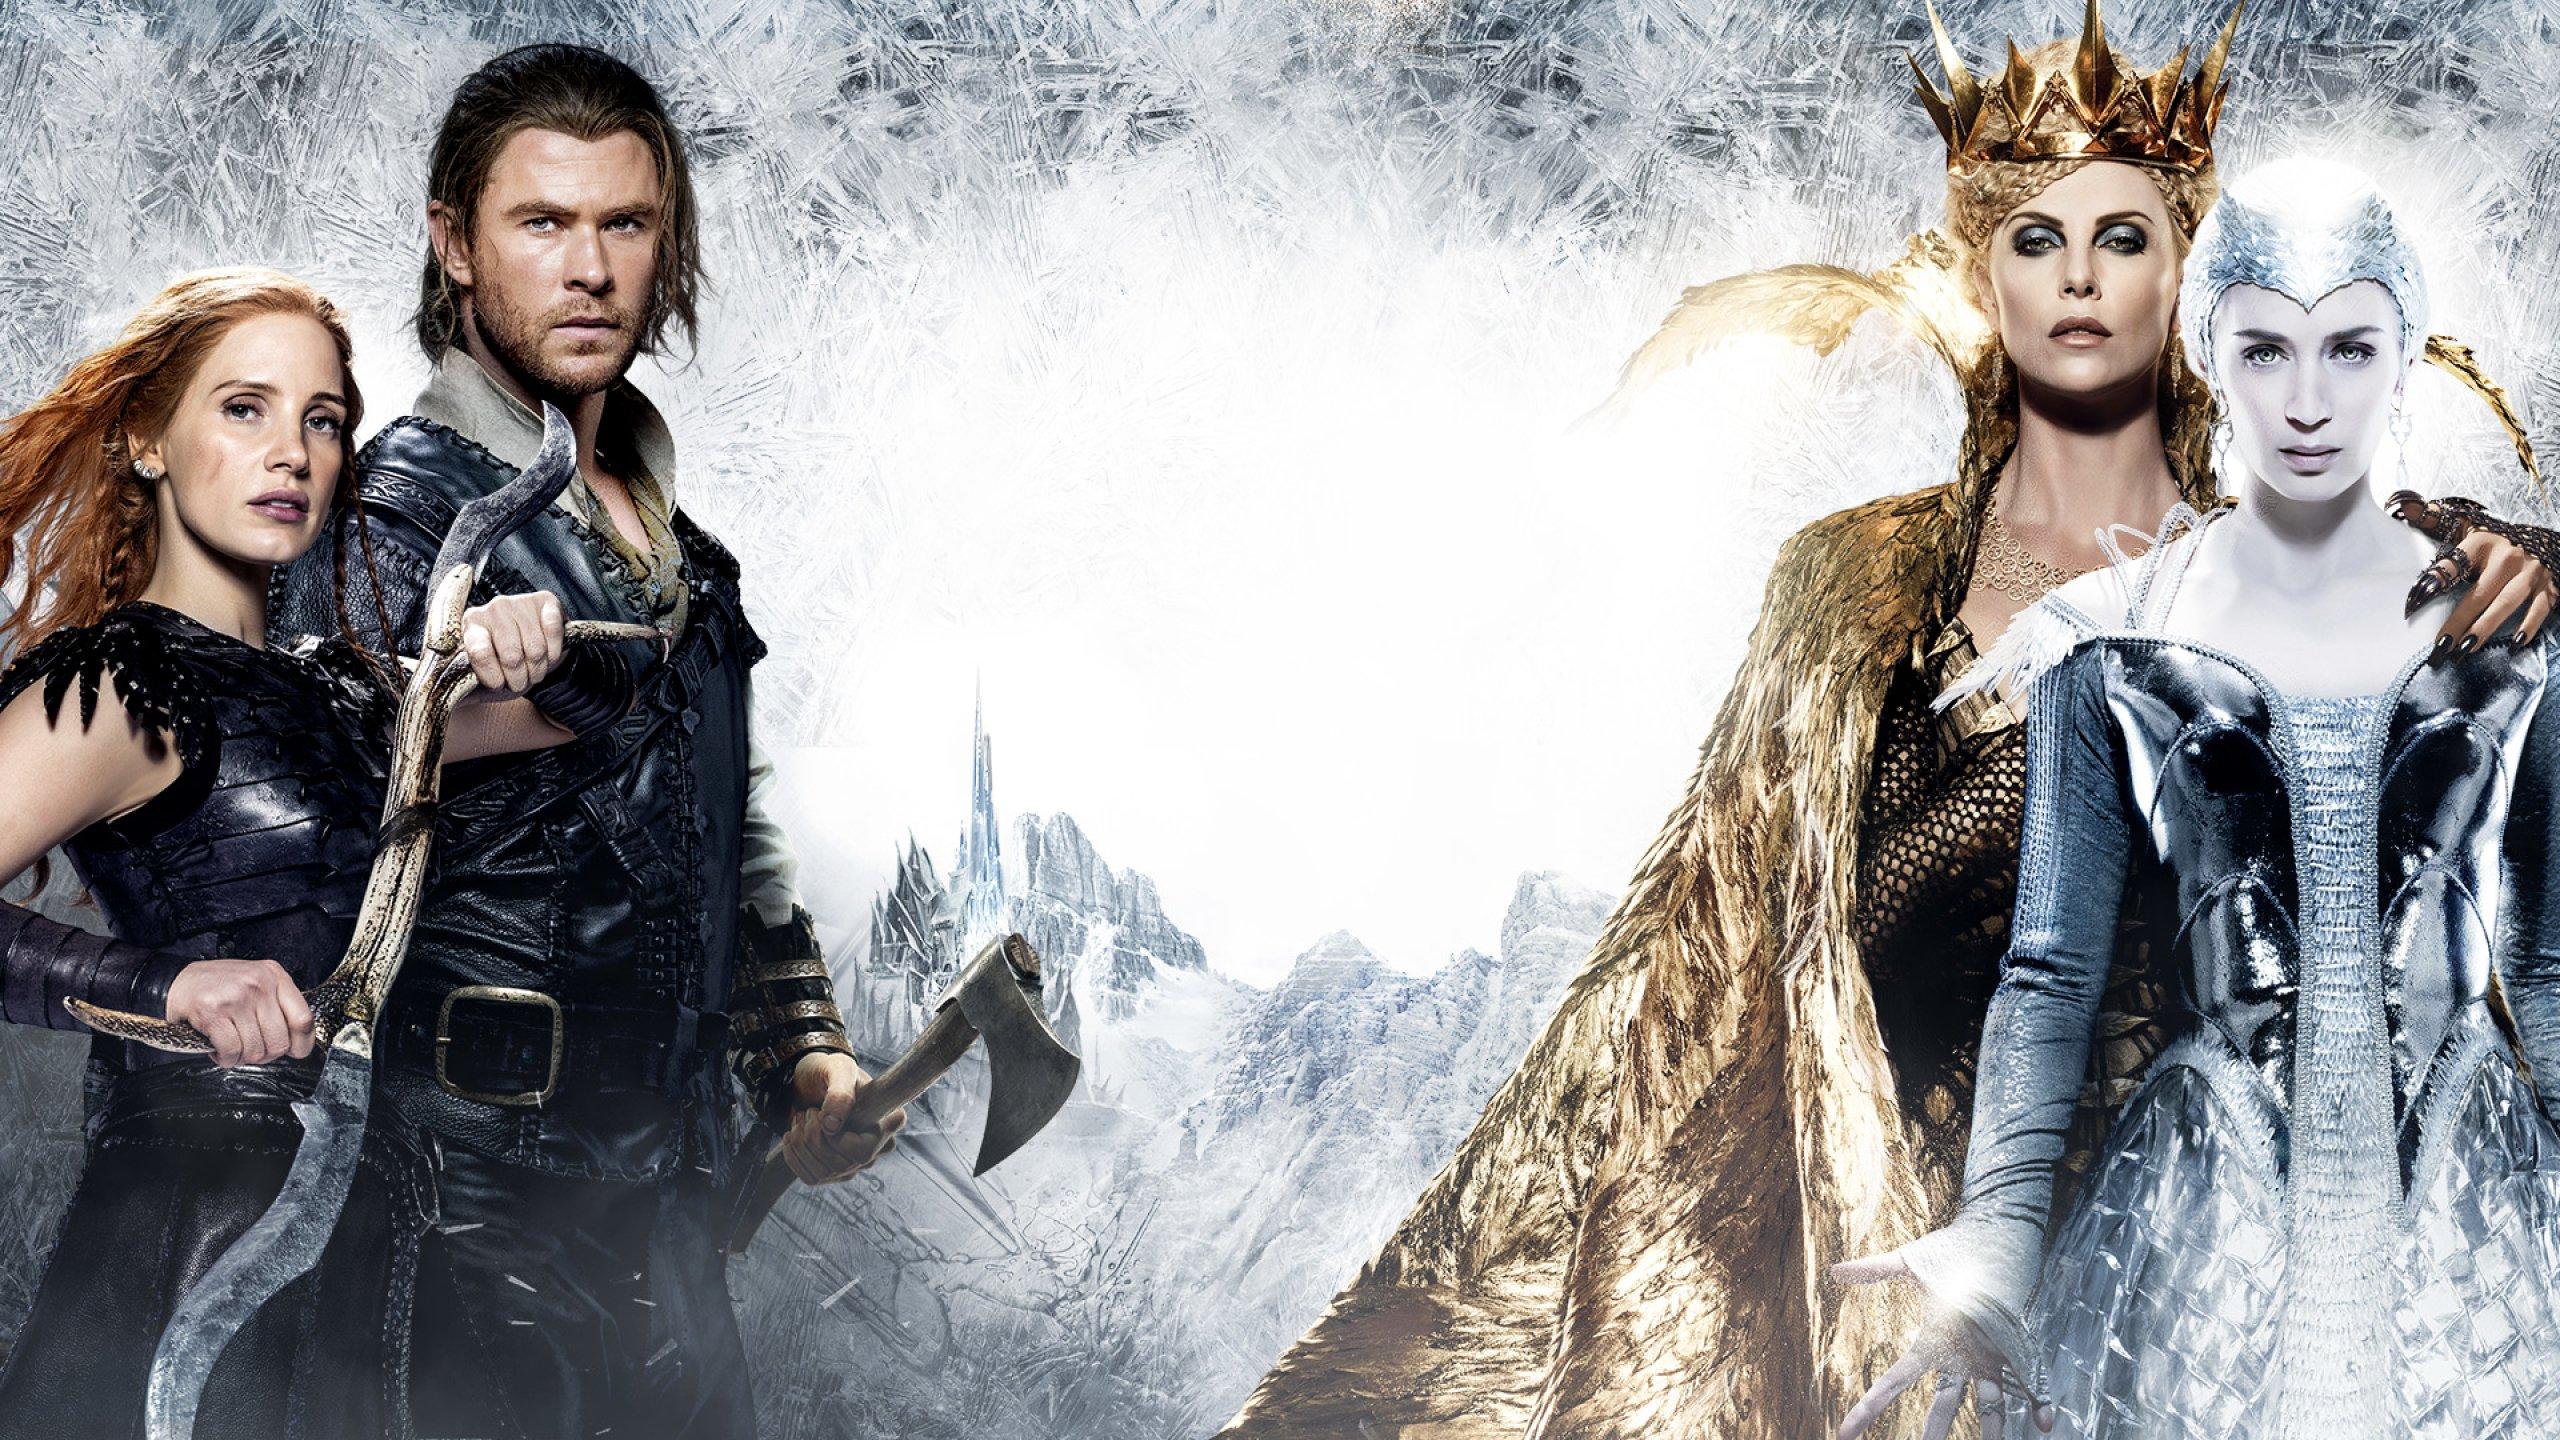 HUNTSMAN WINTERS WAR snow white fantasy action adventure ...